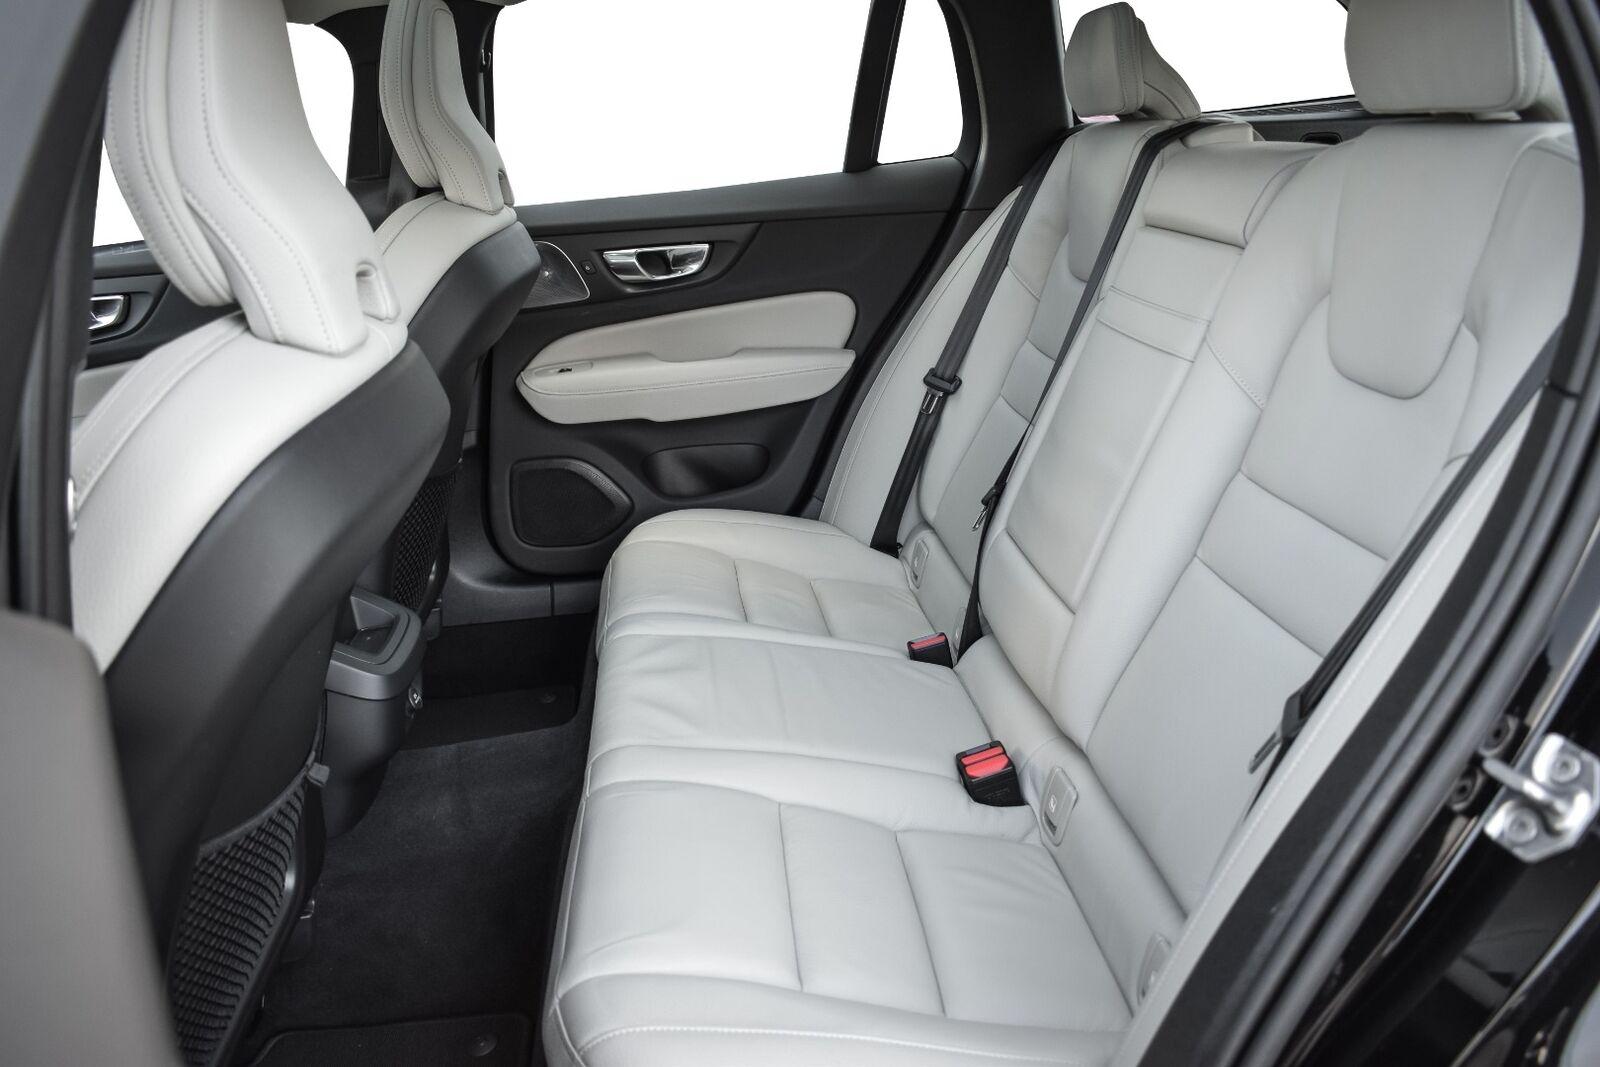 Volvo V60 2,0 T6 310 Inscription aut. AWD - billede 7